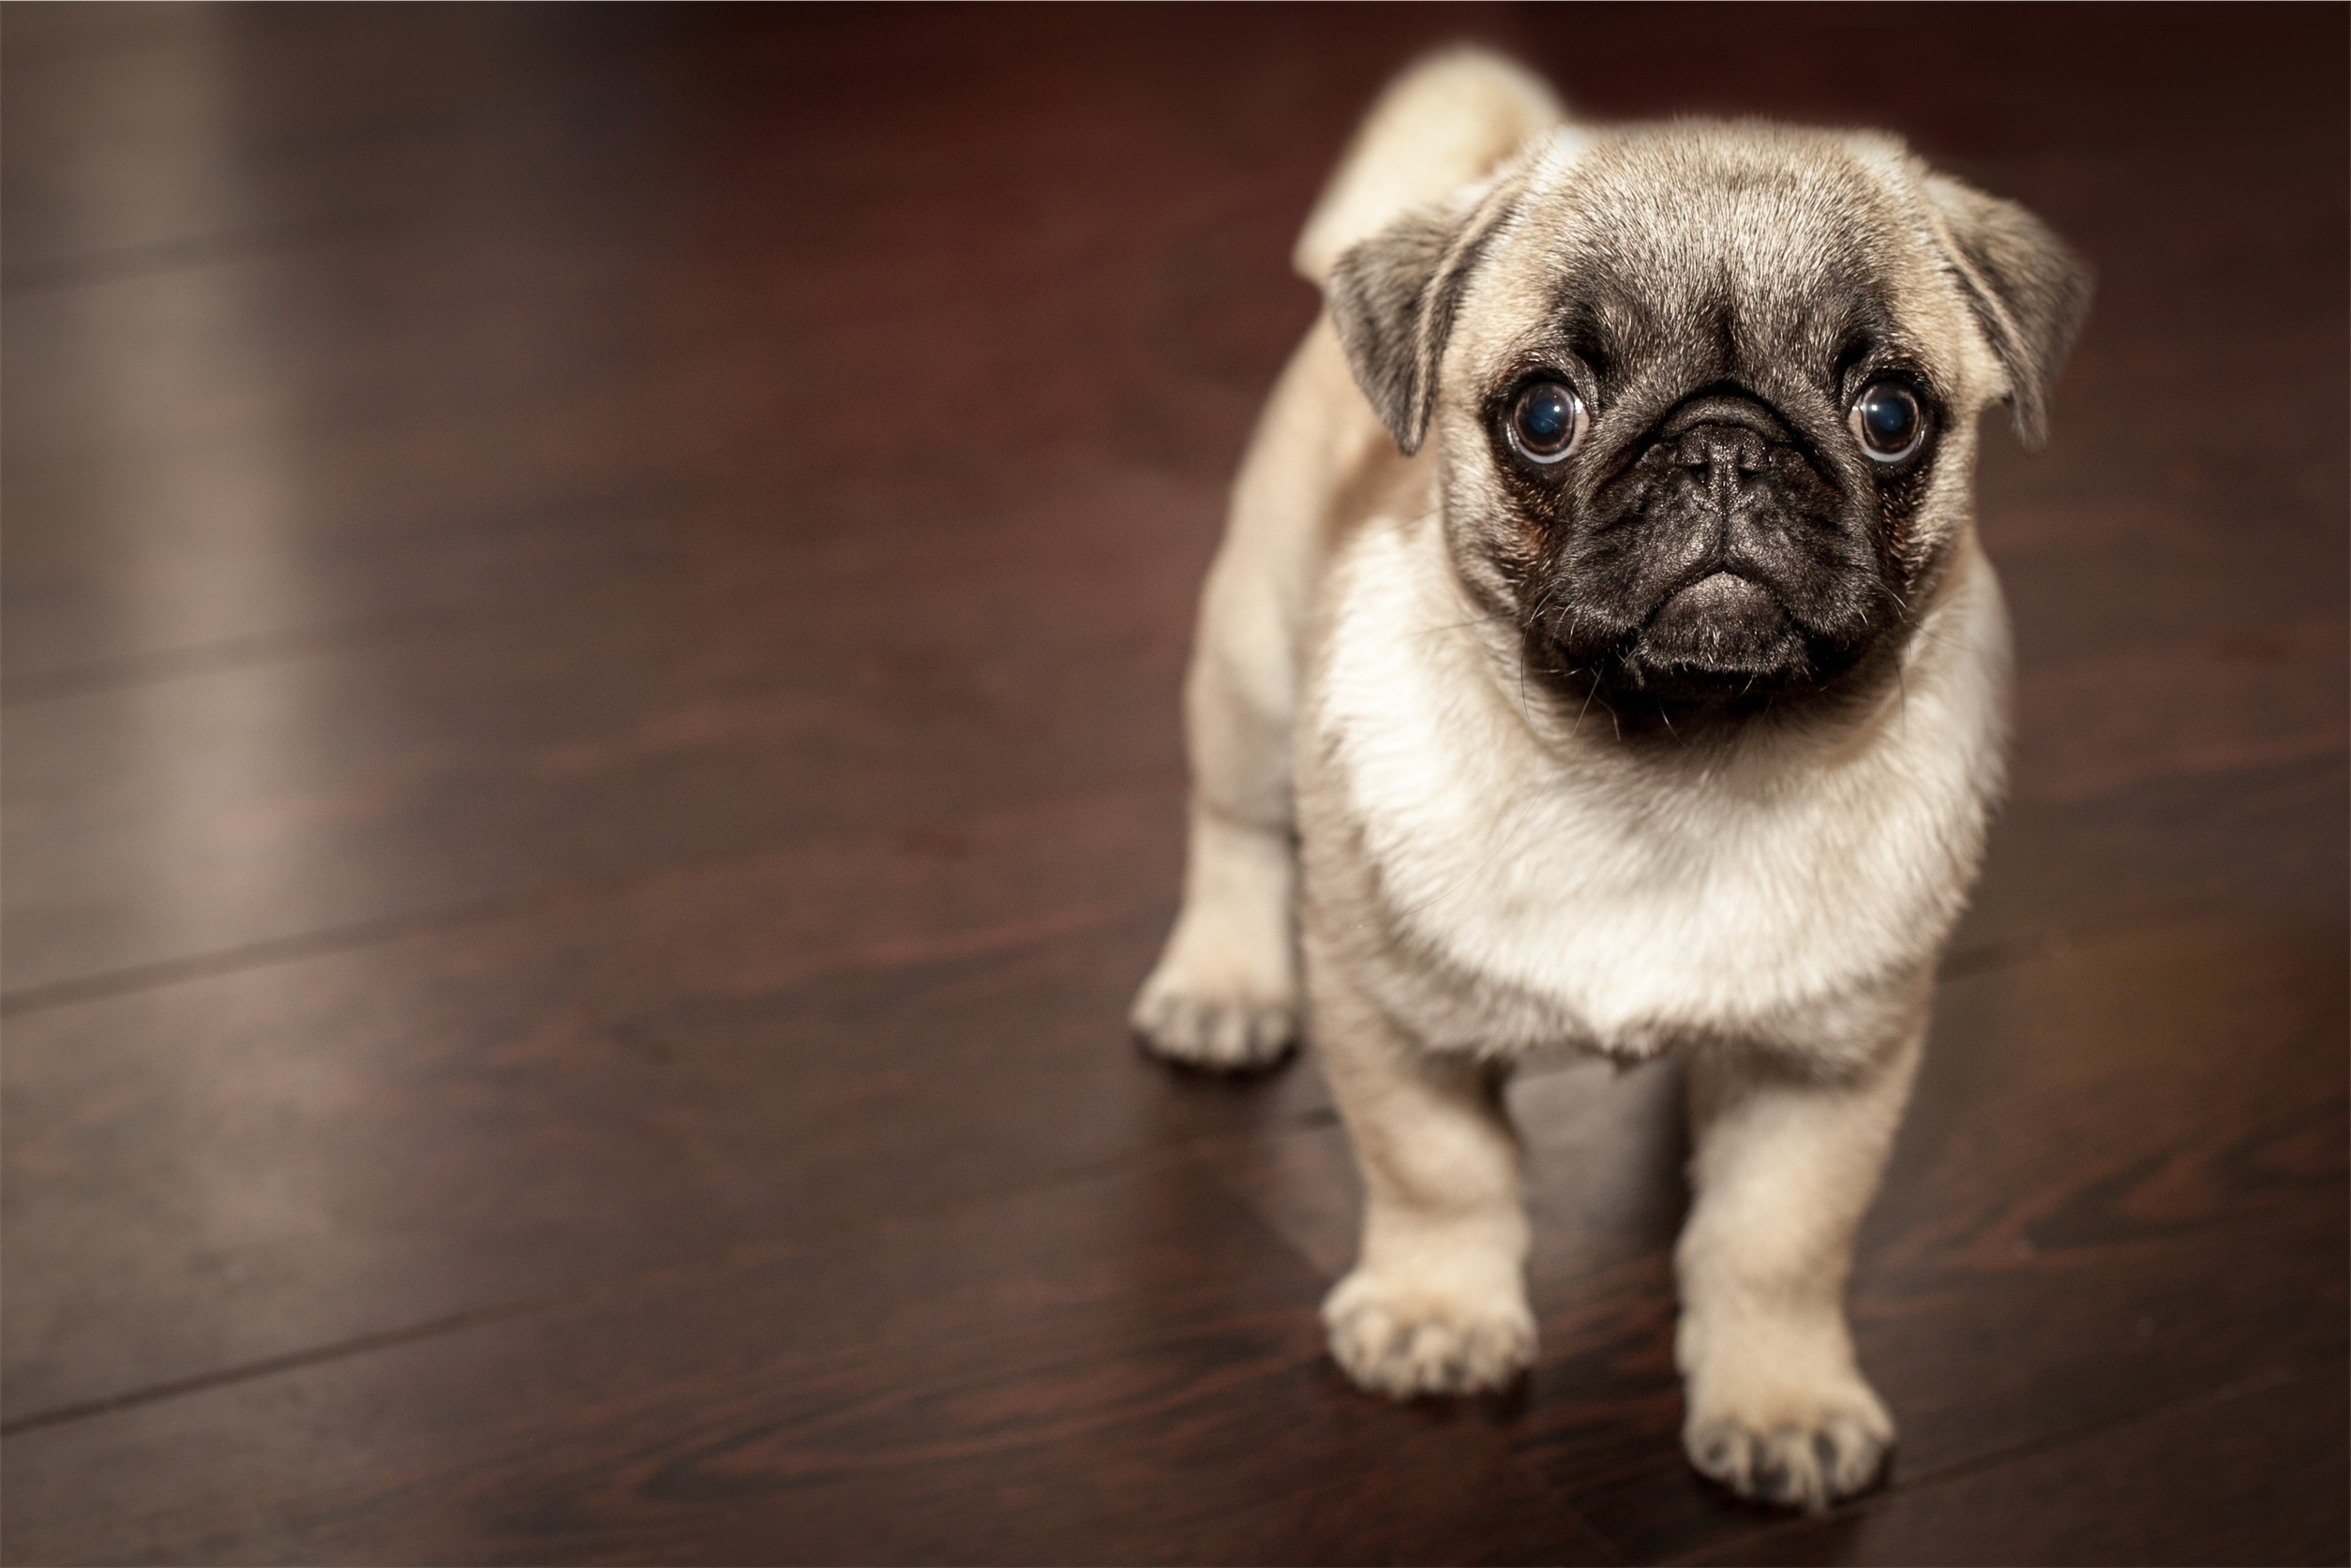 1557169057adopt-this-pug